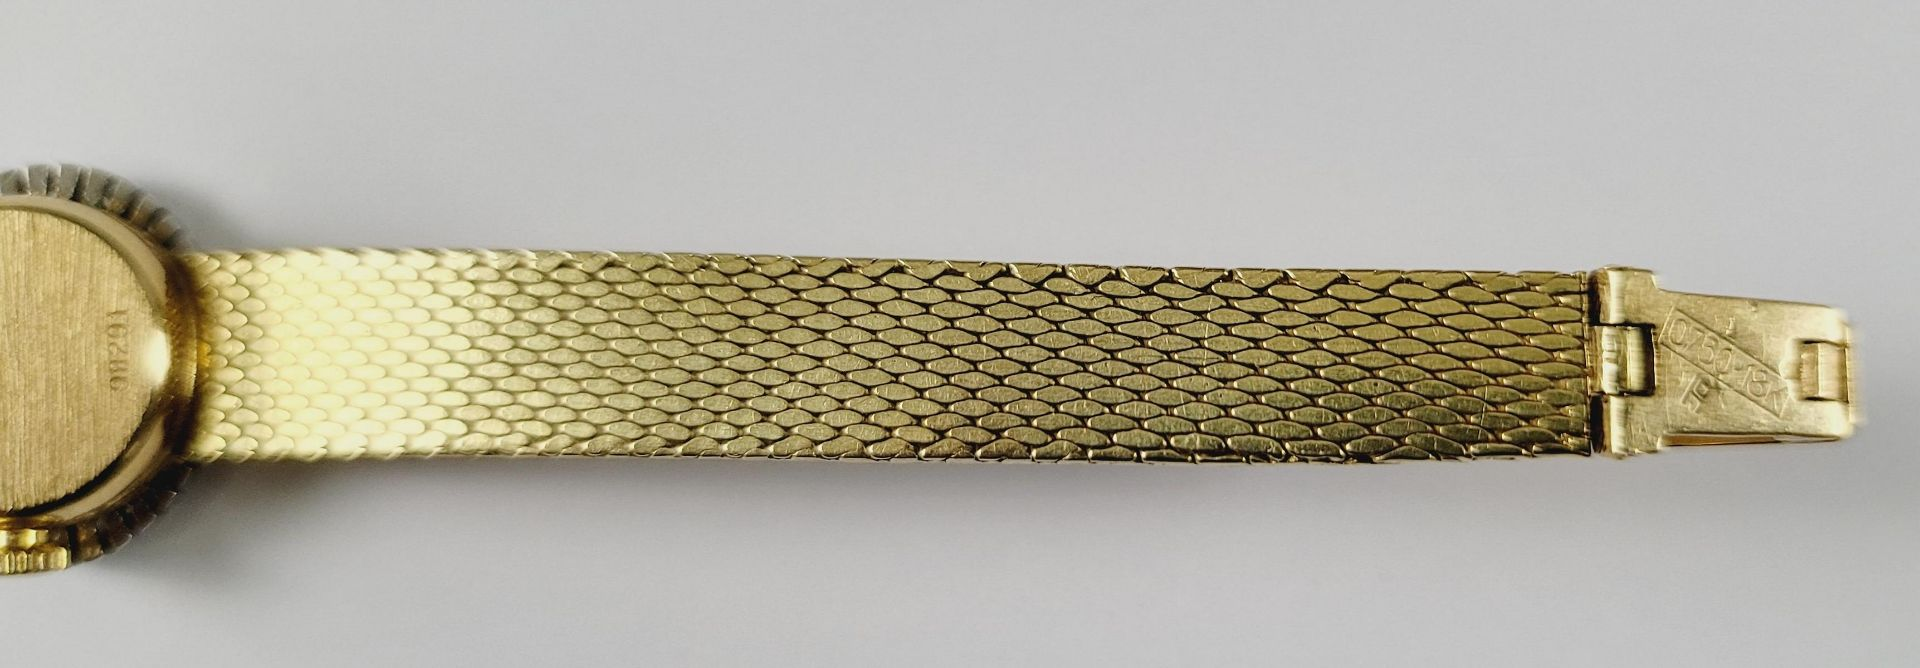 Damenarmbanduhr mit Diamanten, 18 Karat Gelbgold - Bild 4 aus 4